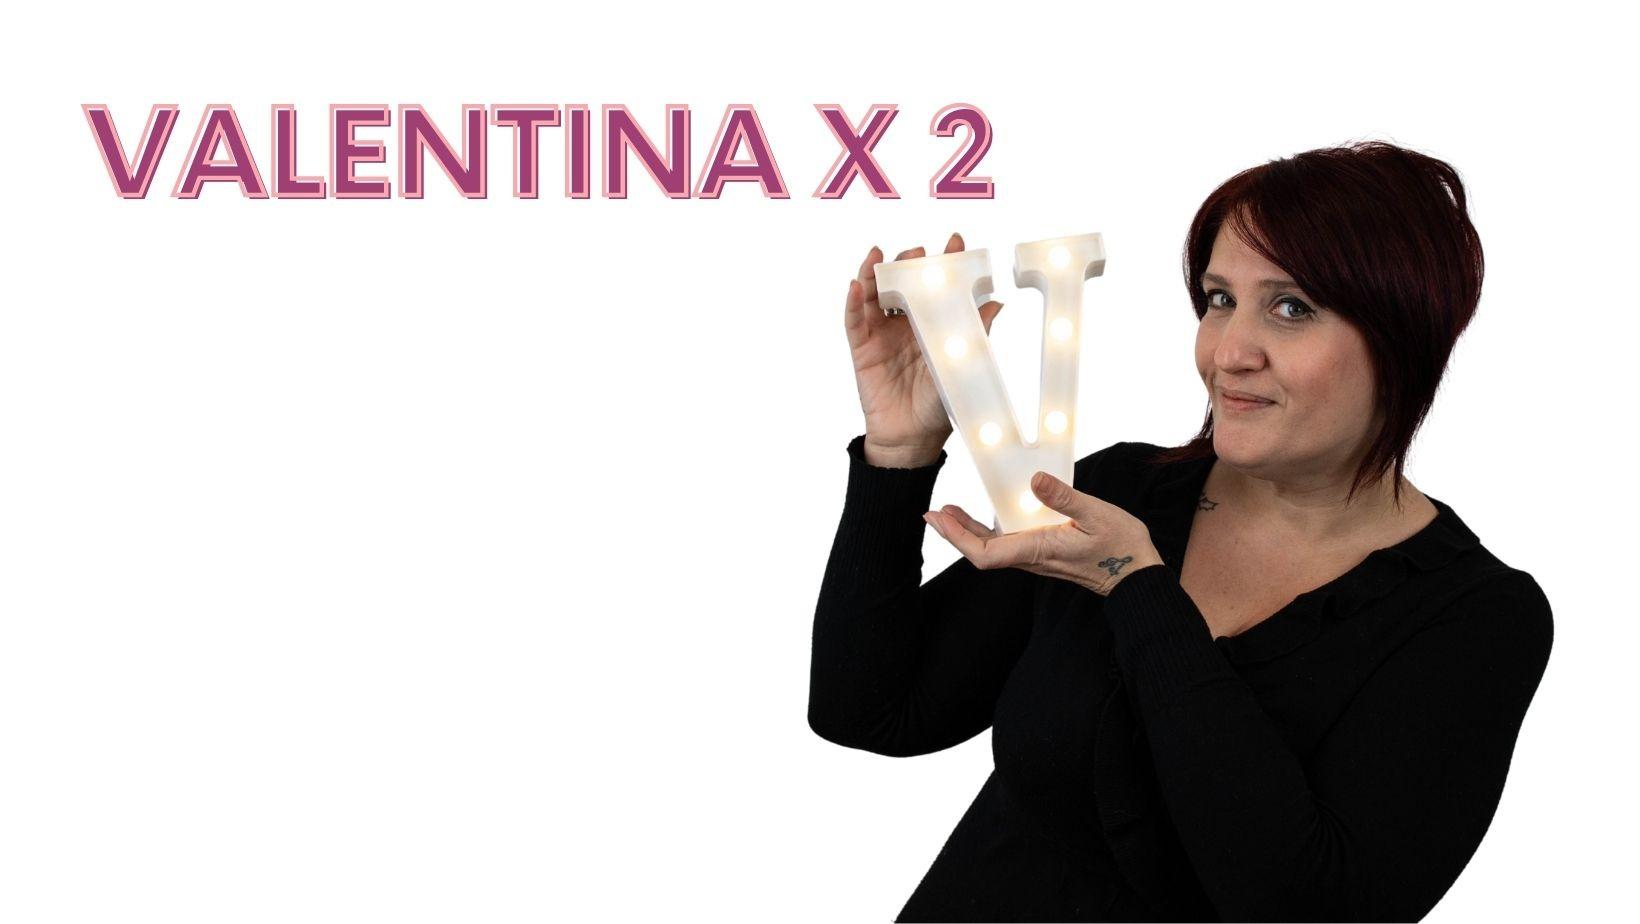 Valentina X2